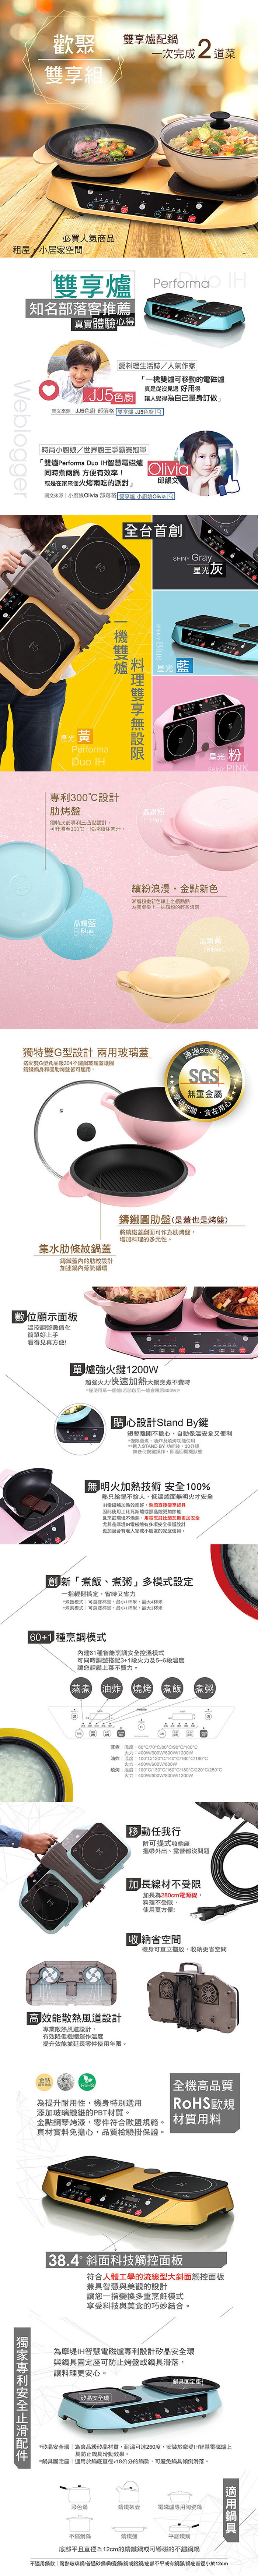 MULTEE摩堤|歡聚雙享組_雙享鍋+IH雙爐(晶鑽黃)